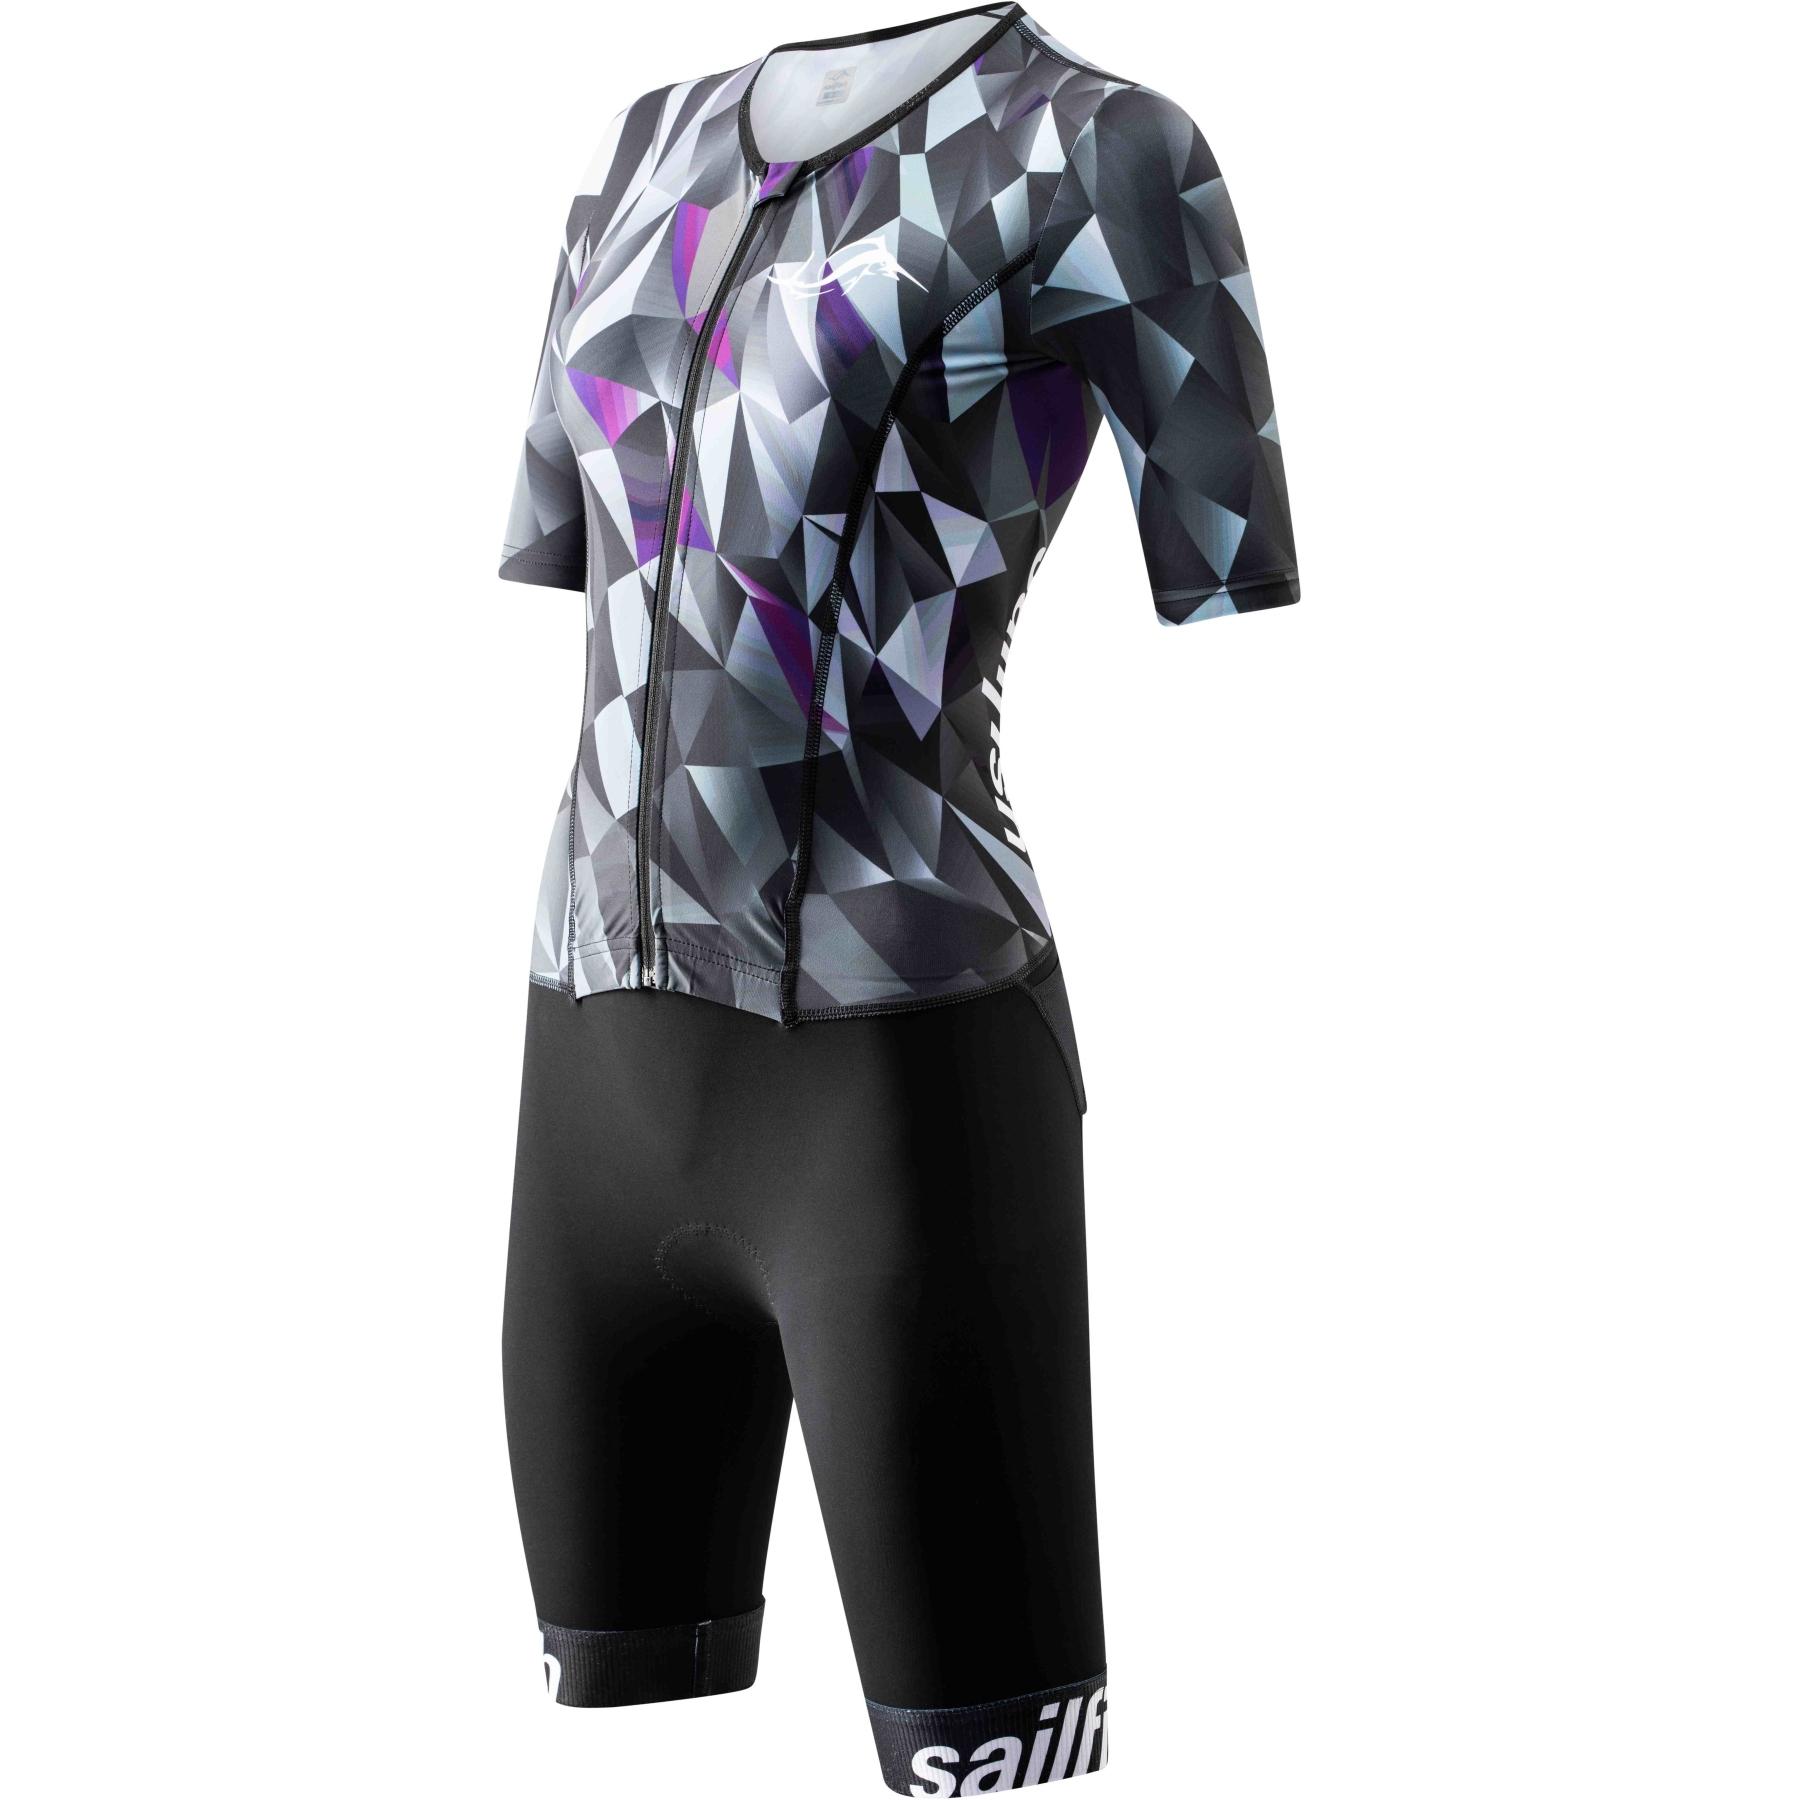 Foto de sailfish Womens Aerosuit Comp Square Mono ciclismo carretera 2021 - berry